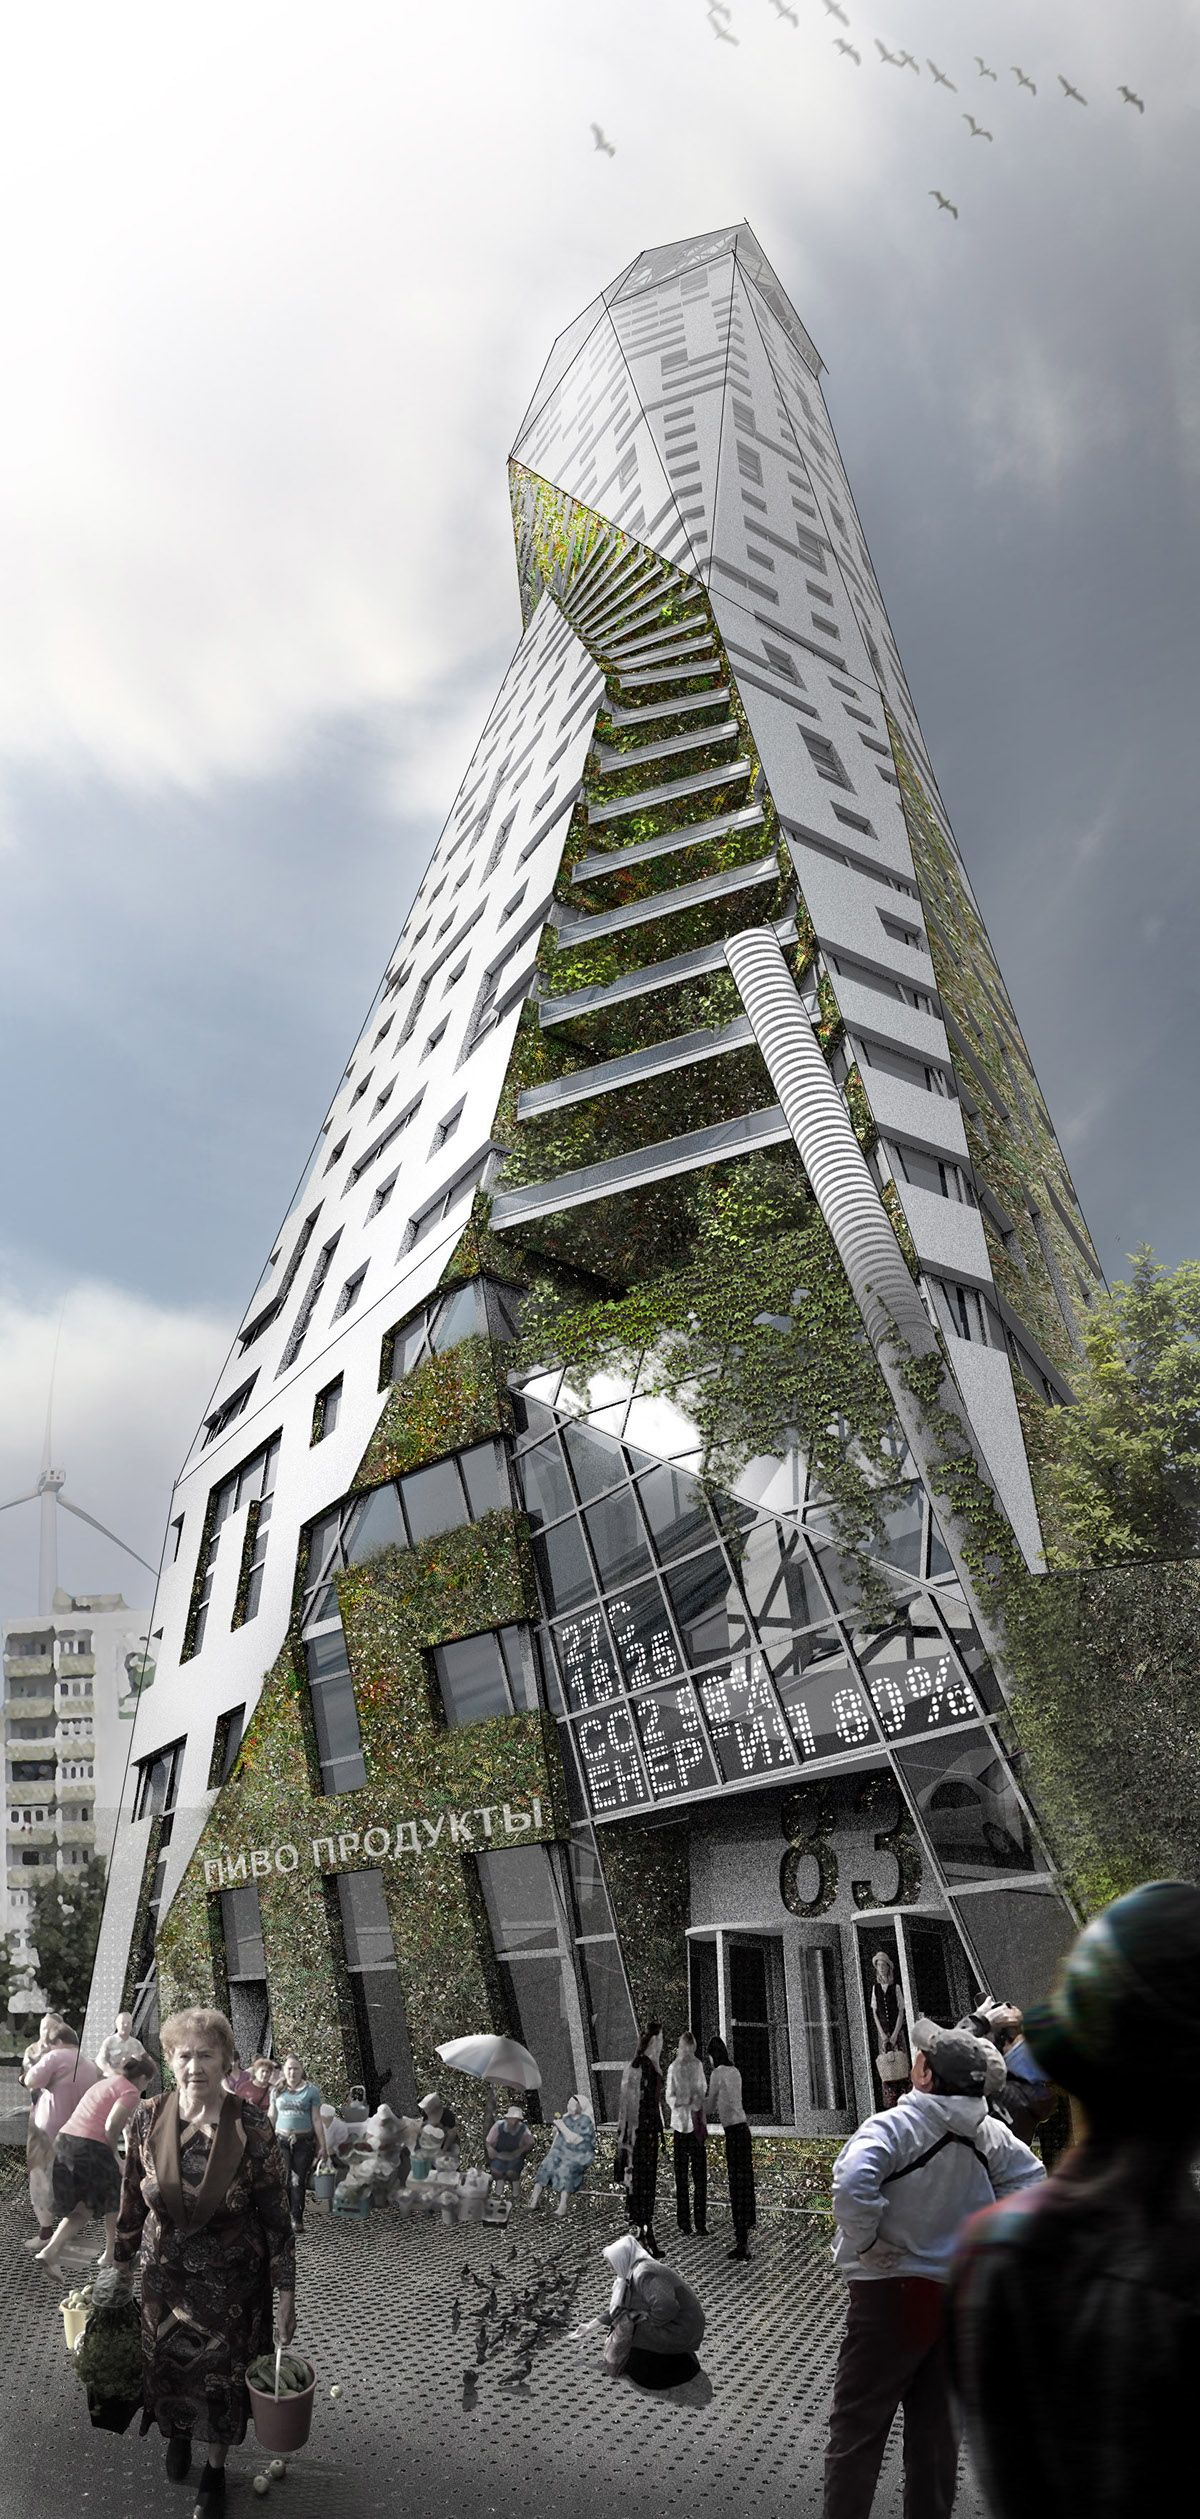 Eco Tower Behance Project Bypavlo Kryvozub Kiev Ukraine Architecture